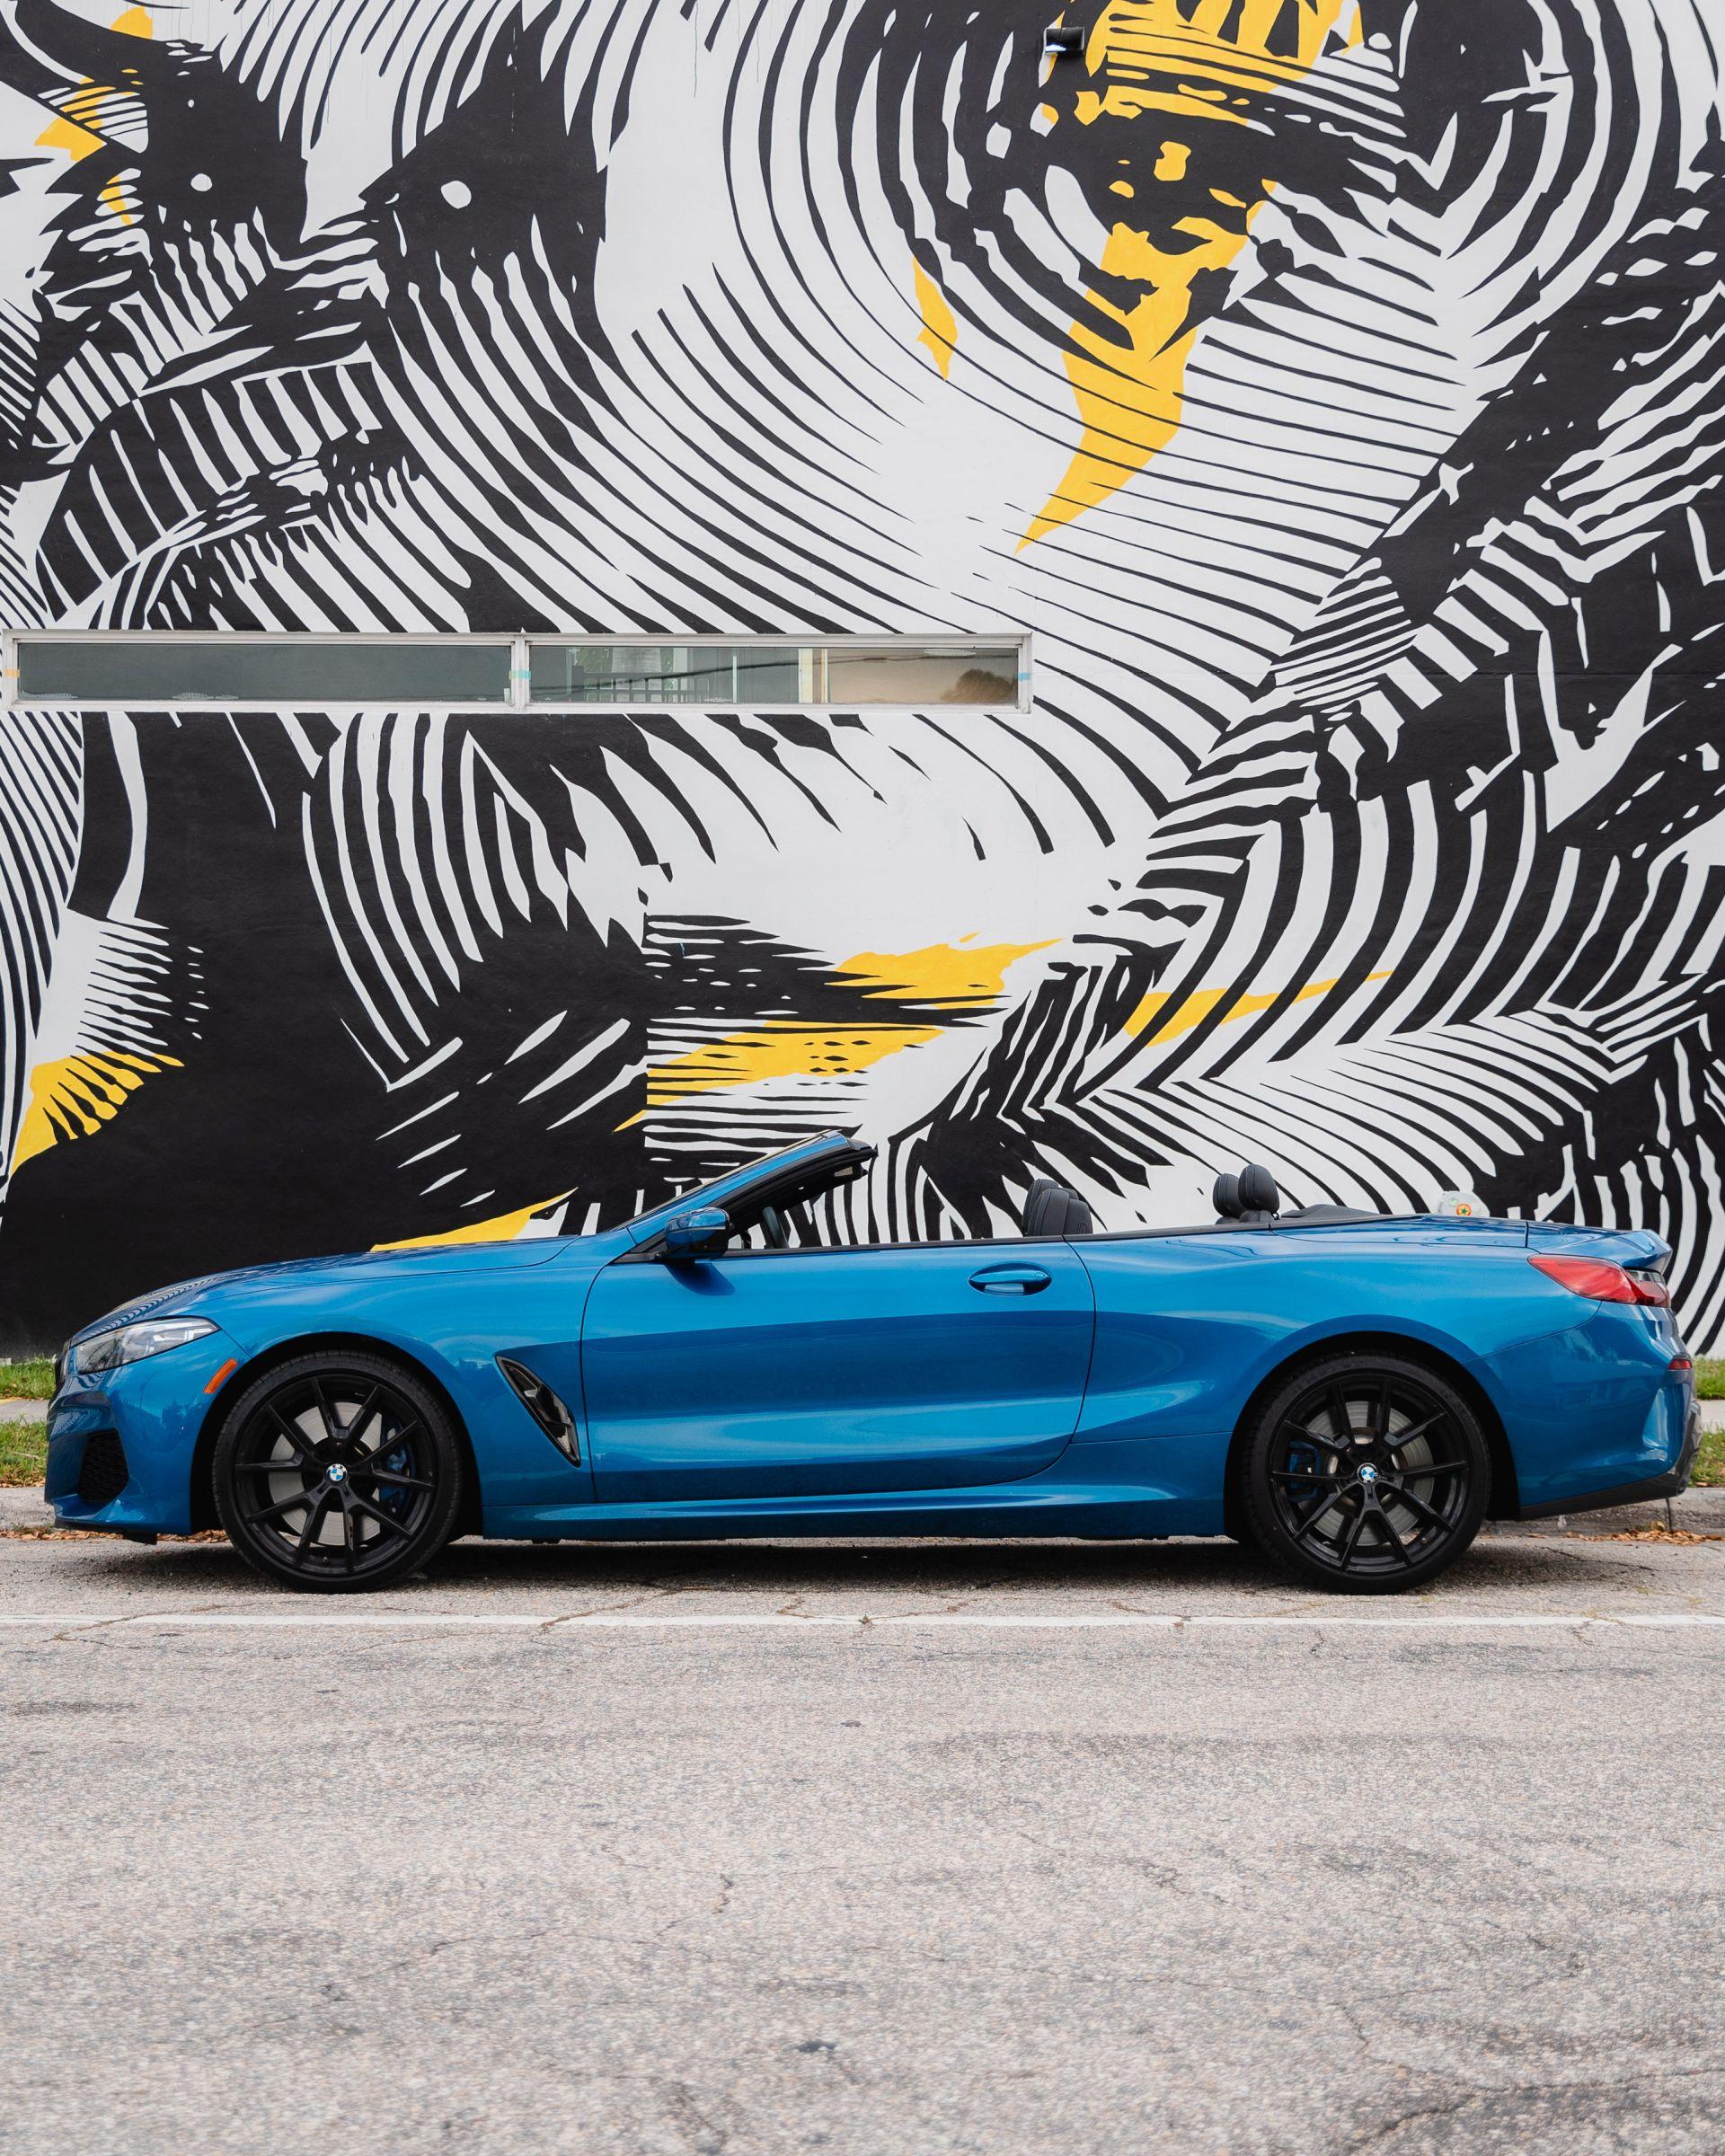 Photo Gallery: BMW M850i XDrive Convertible Goes Art